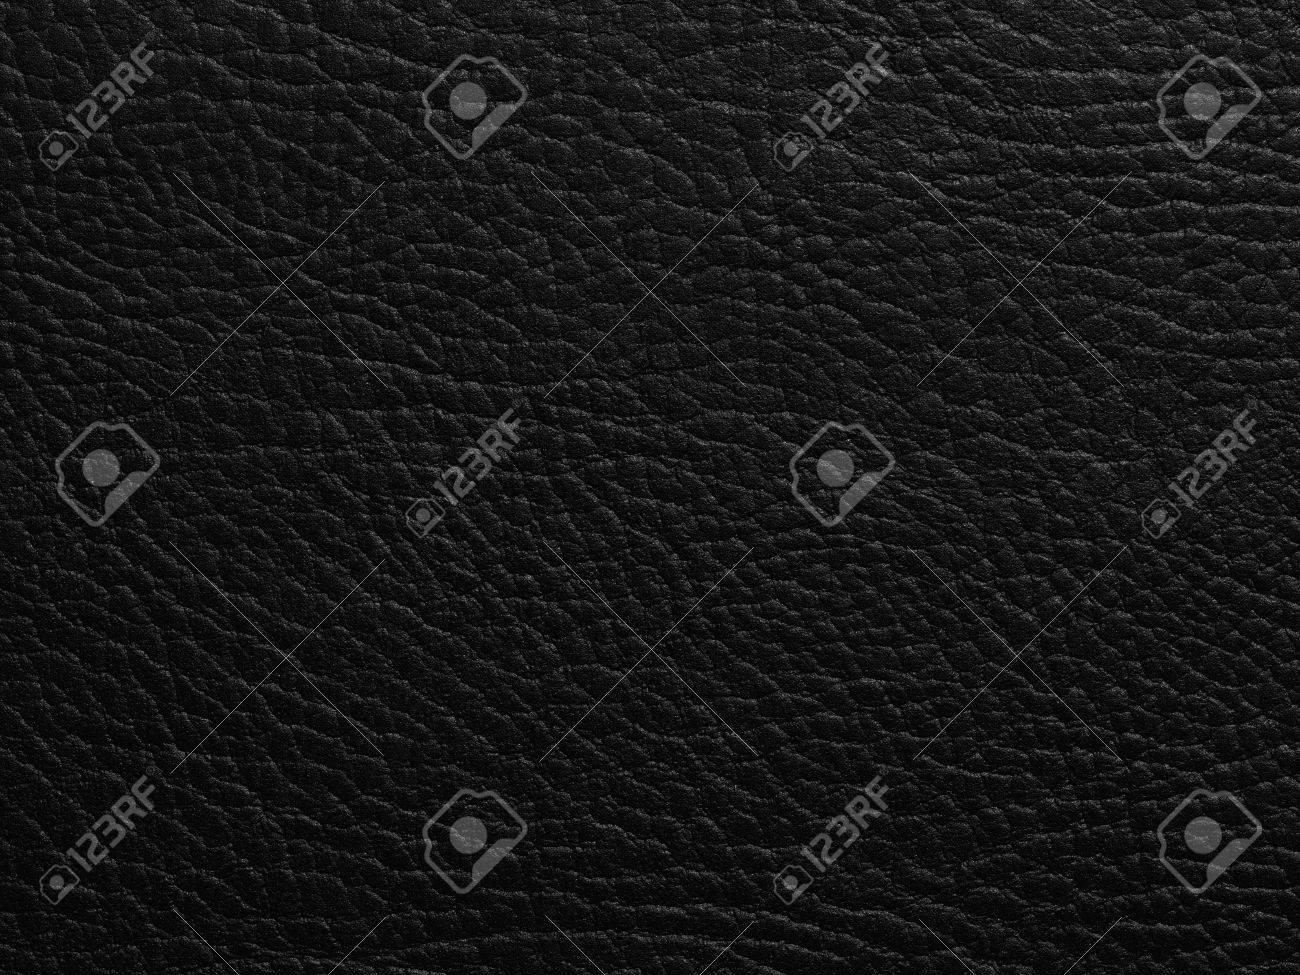 Black leather texture closeup Standard-Bild - 41374816